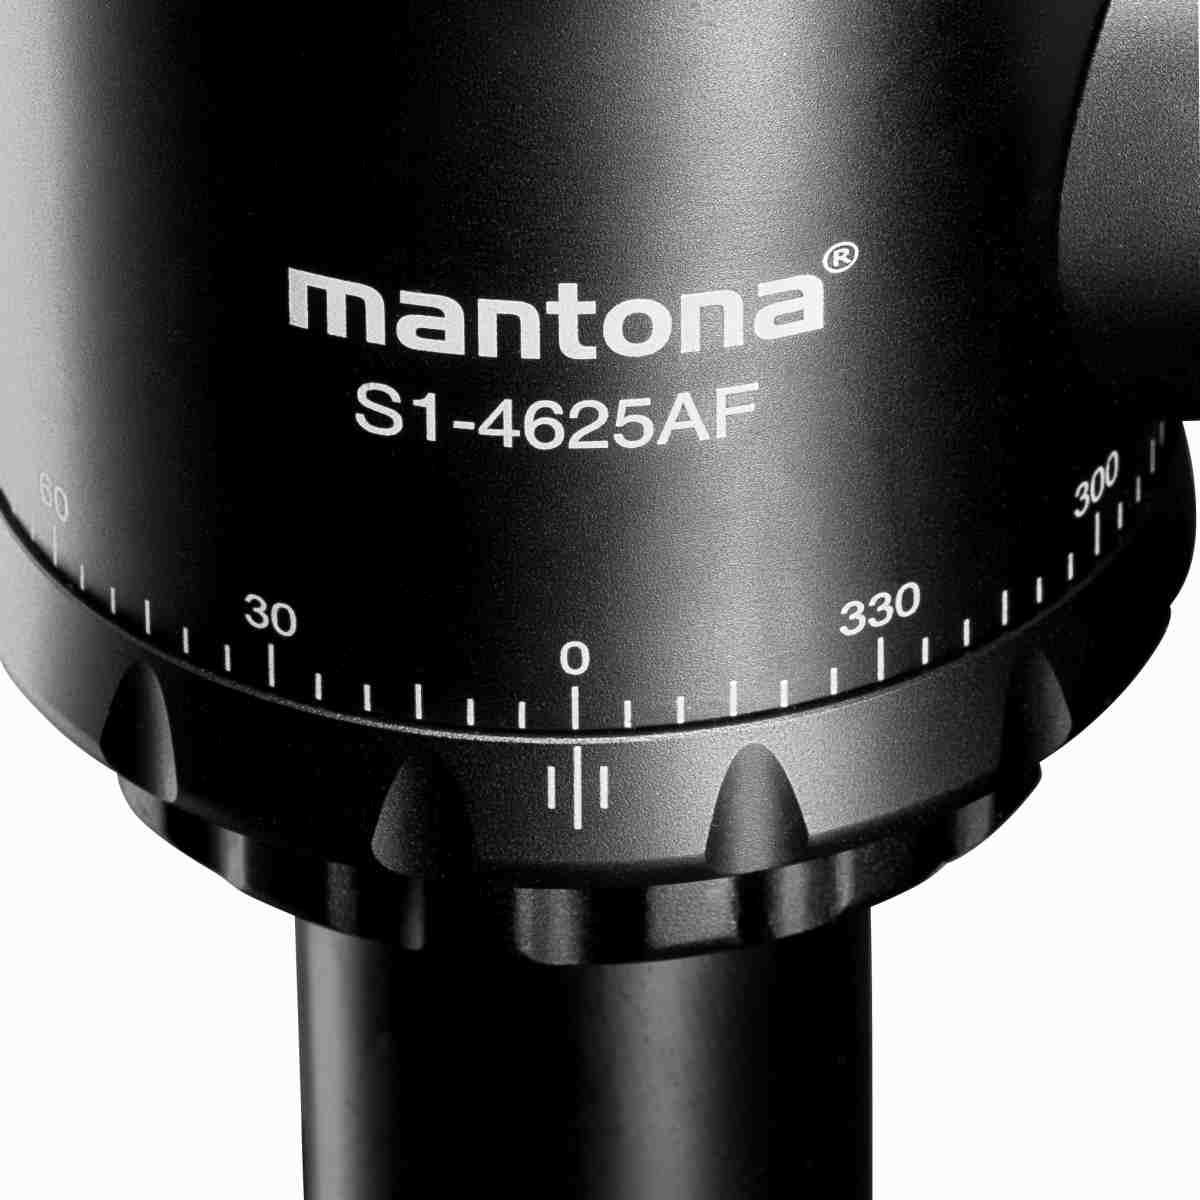 Mantona Superior S1-4625AF